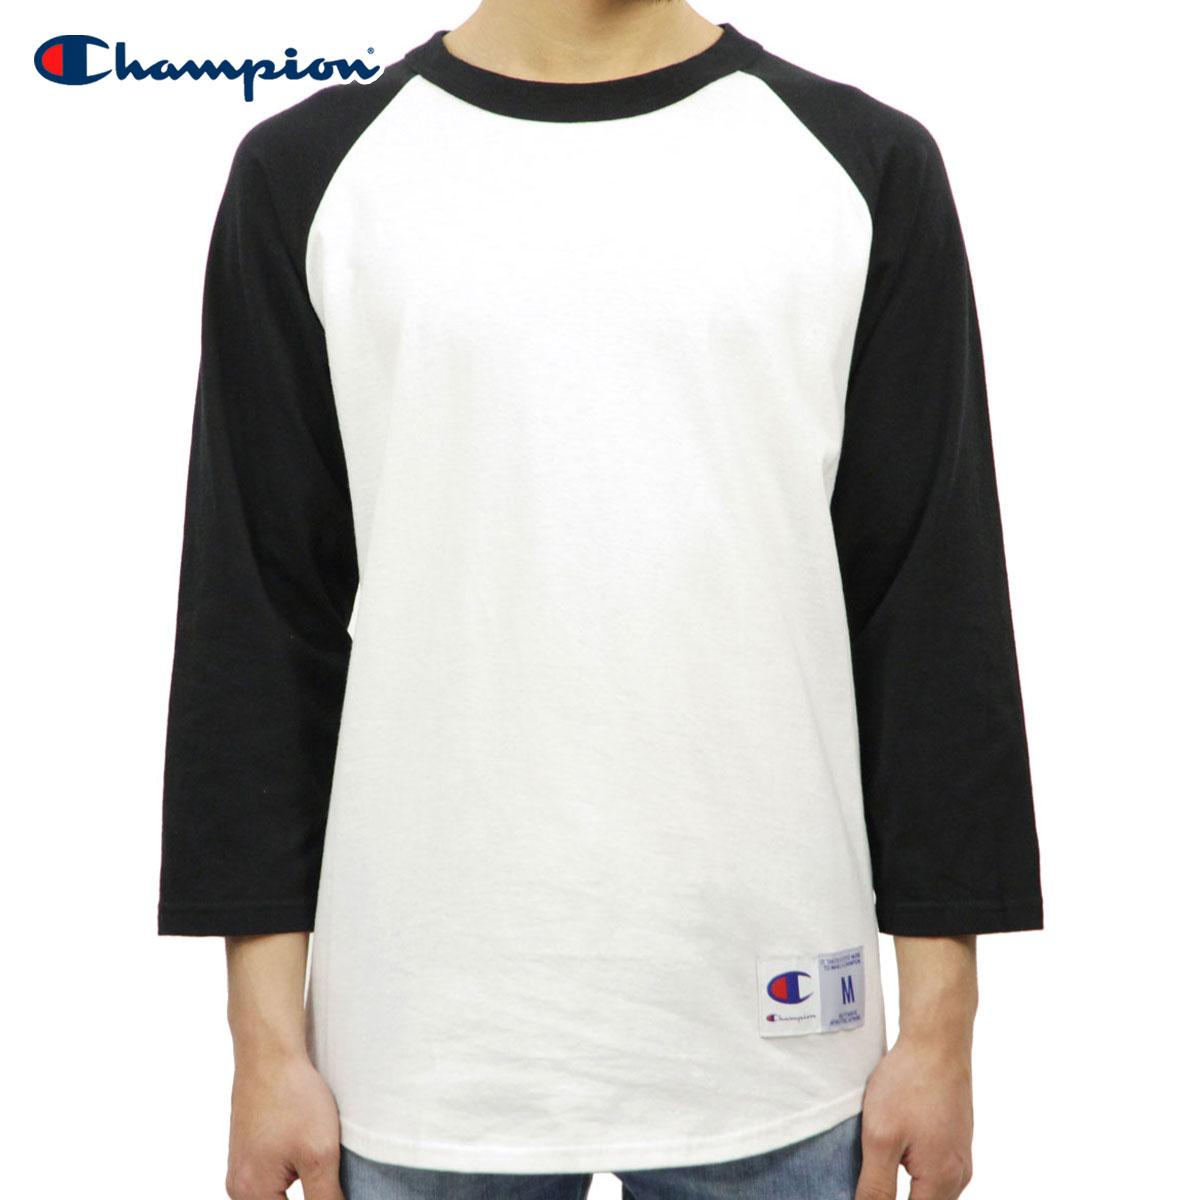 a94b6b103a Champion CHAMPION regular article men long sleeves T-shirt RAGLAN TEE T1370  Raglan 3/4 Jersey 074-WHITE/BLACK D00S20